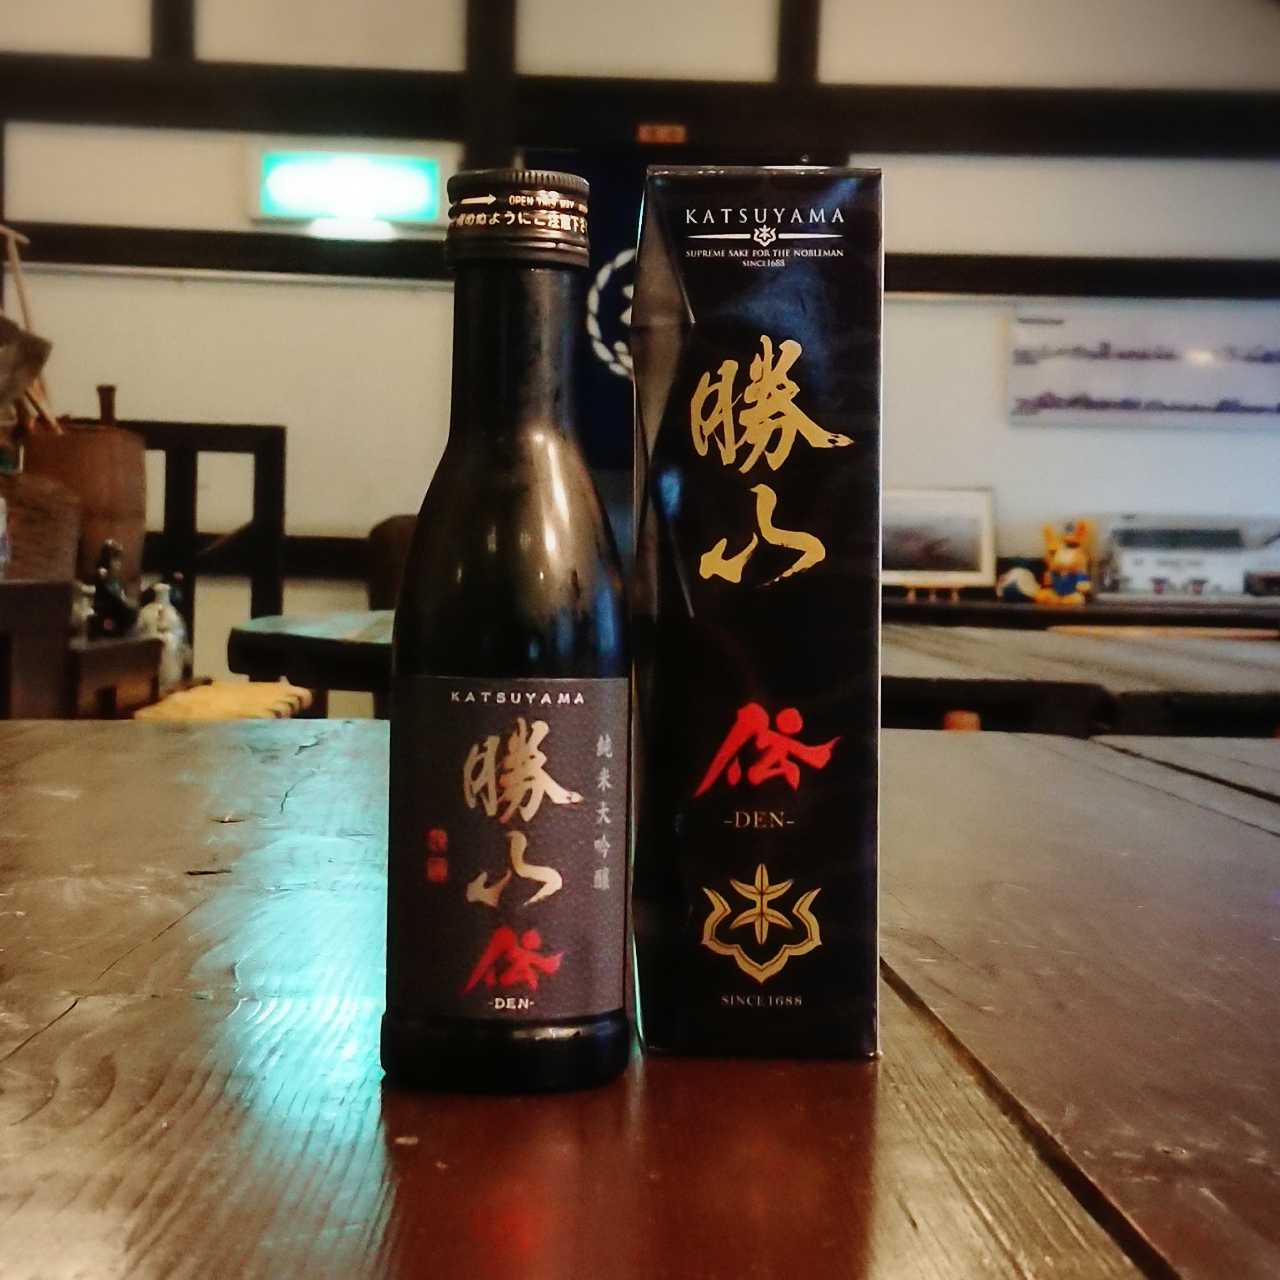 【180mlのお酒】勝山 伝 純米大吟醸(専用箱付き)